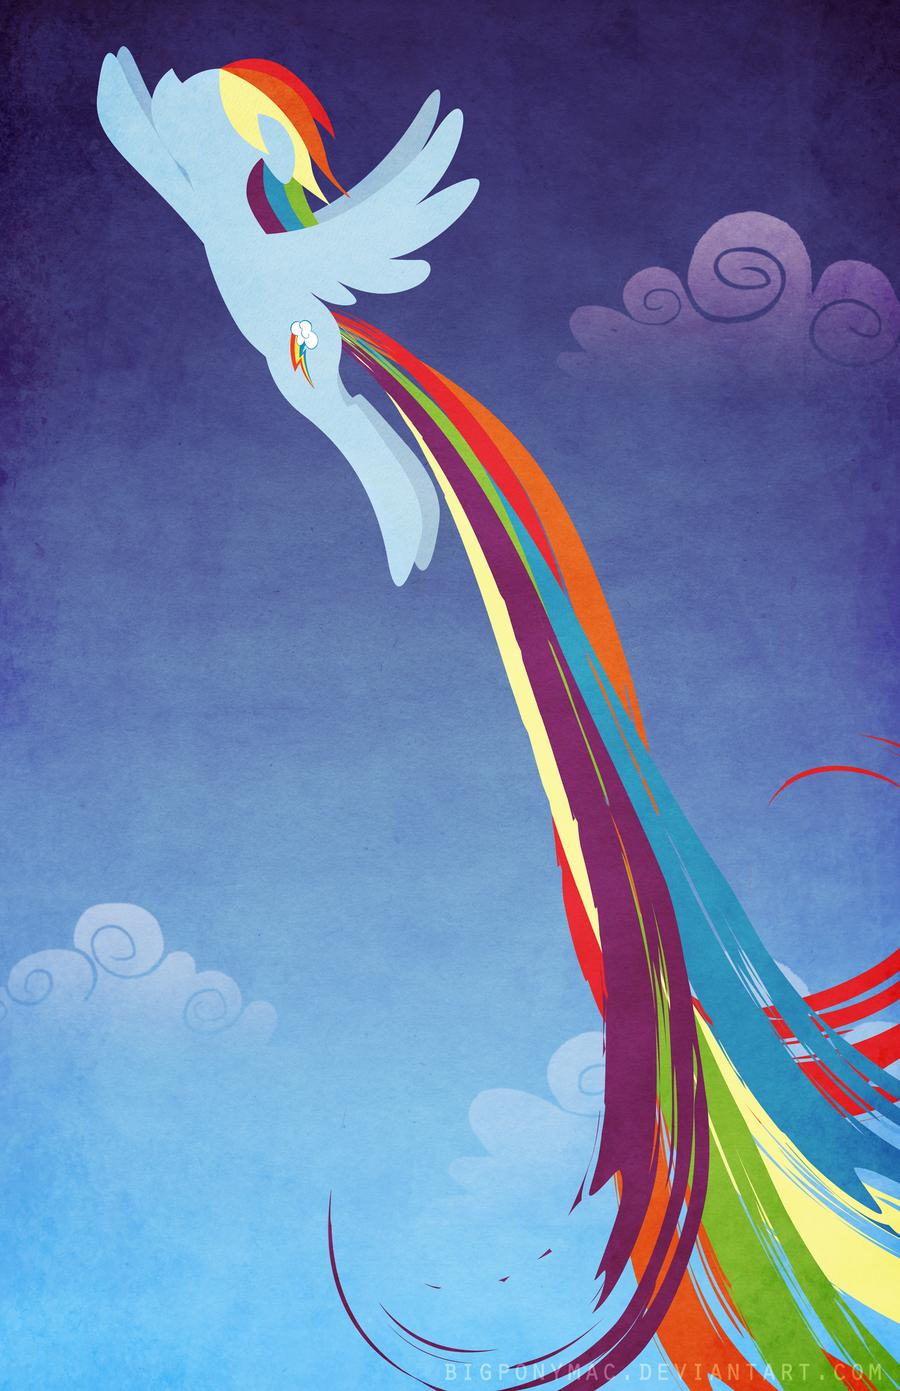 Poster design mac -  Rainbow Dash Poster Design Final No Text By Bigponymac